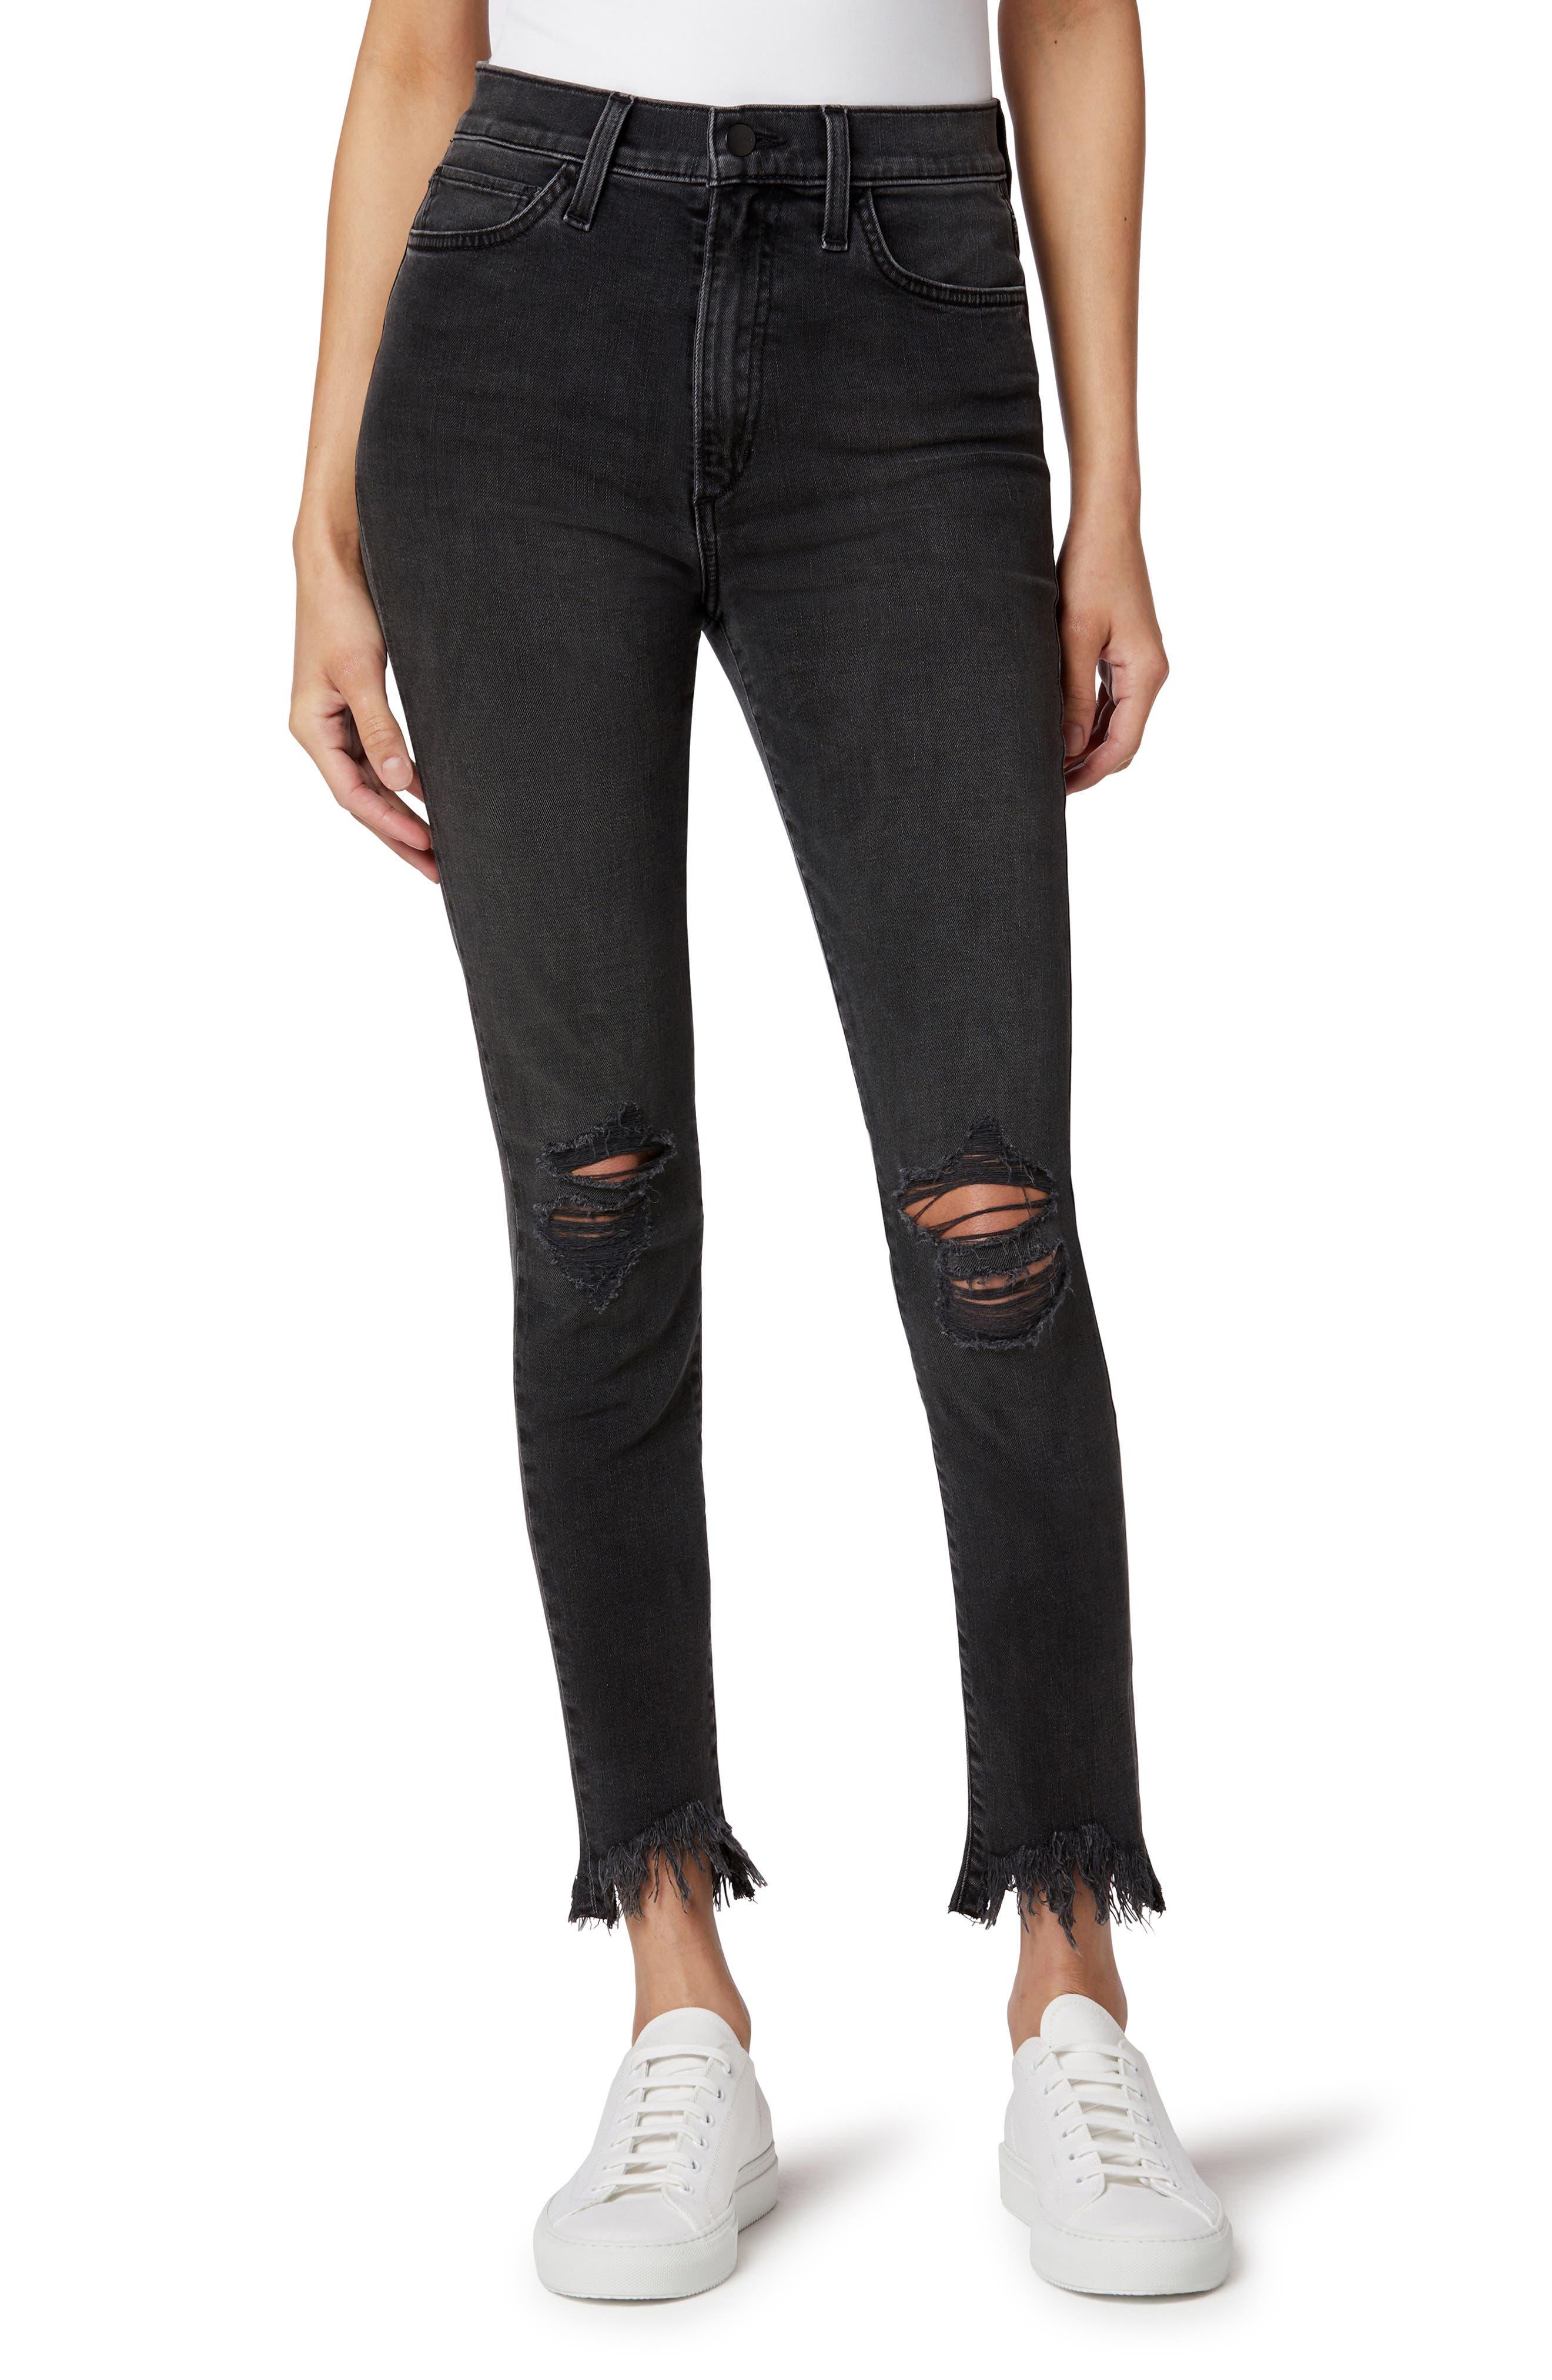 The Bella Ripped High Waist Fray Hem Skinny Jeans